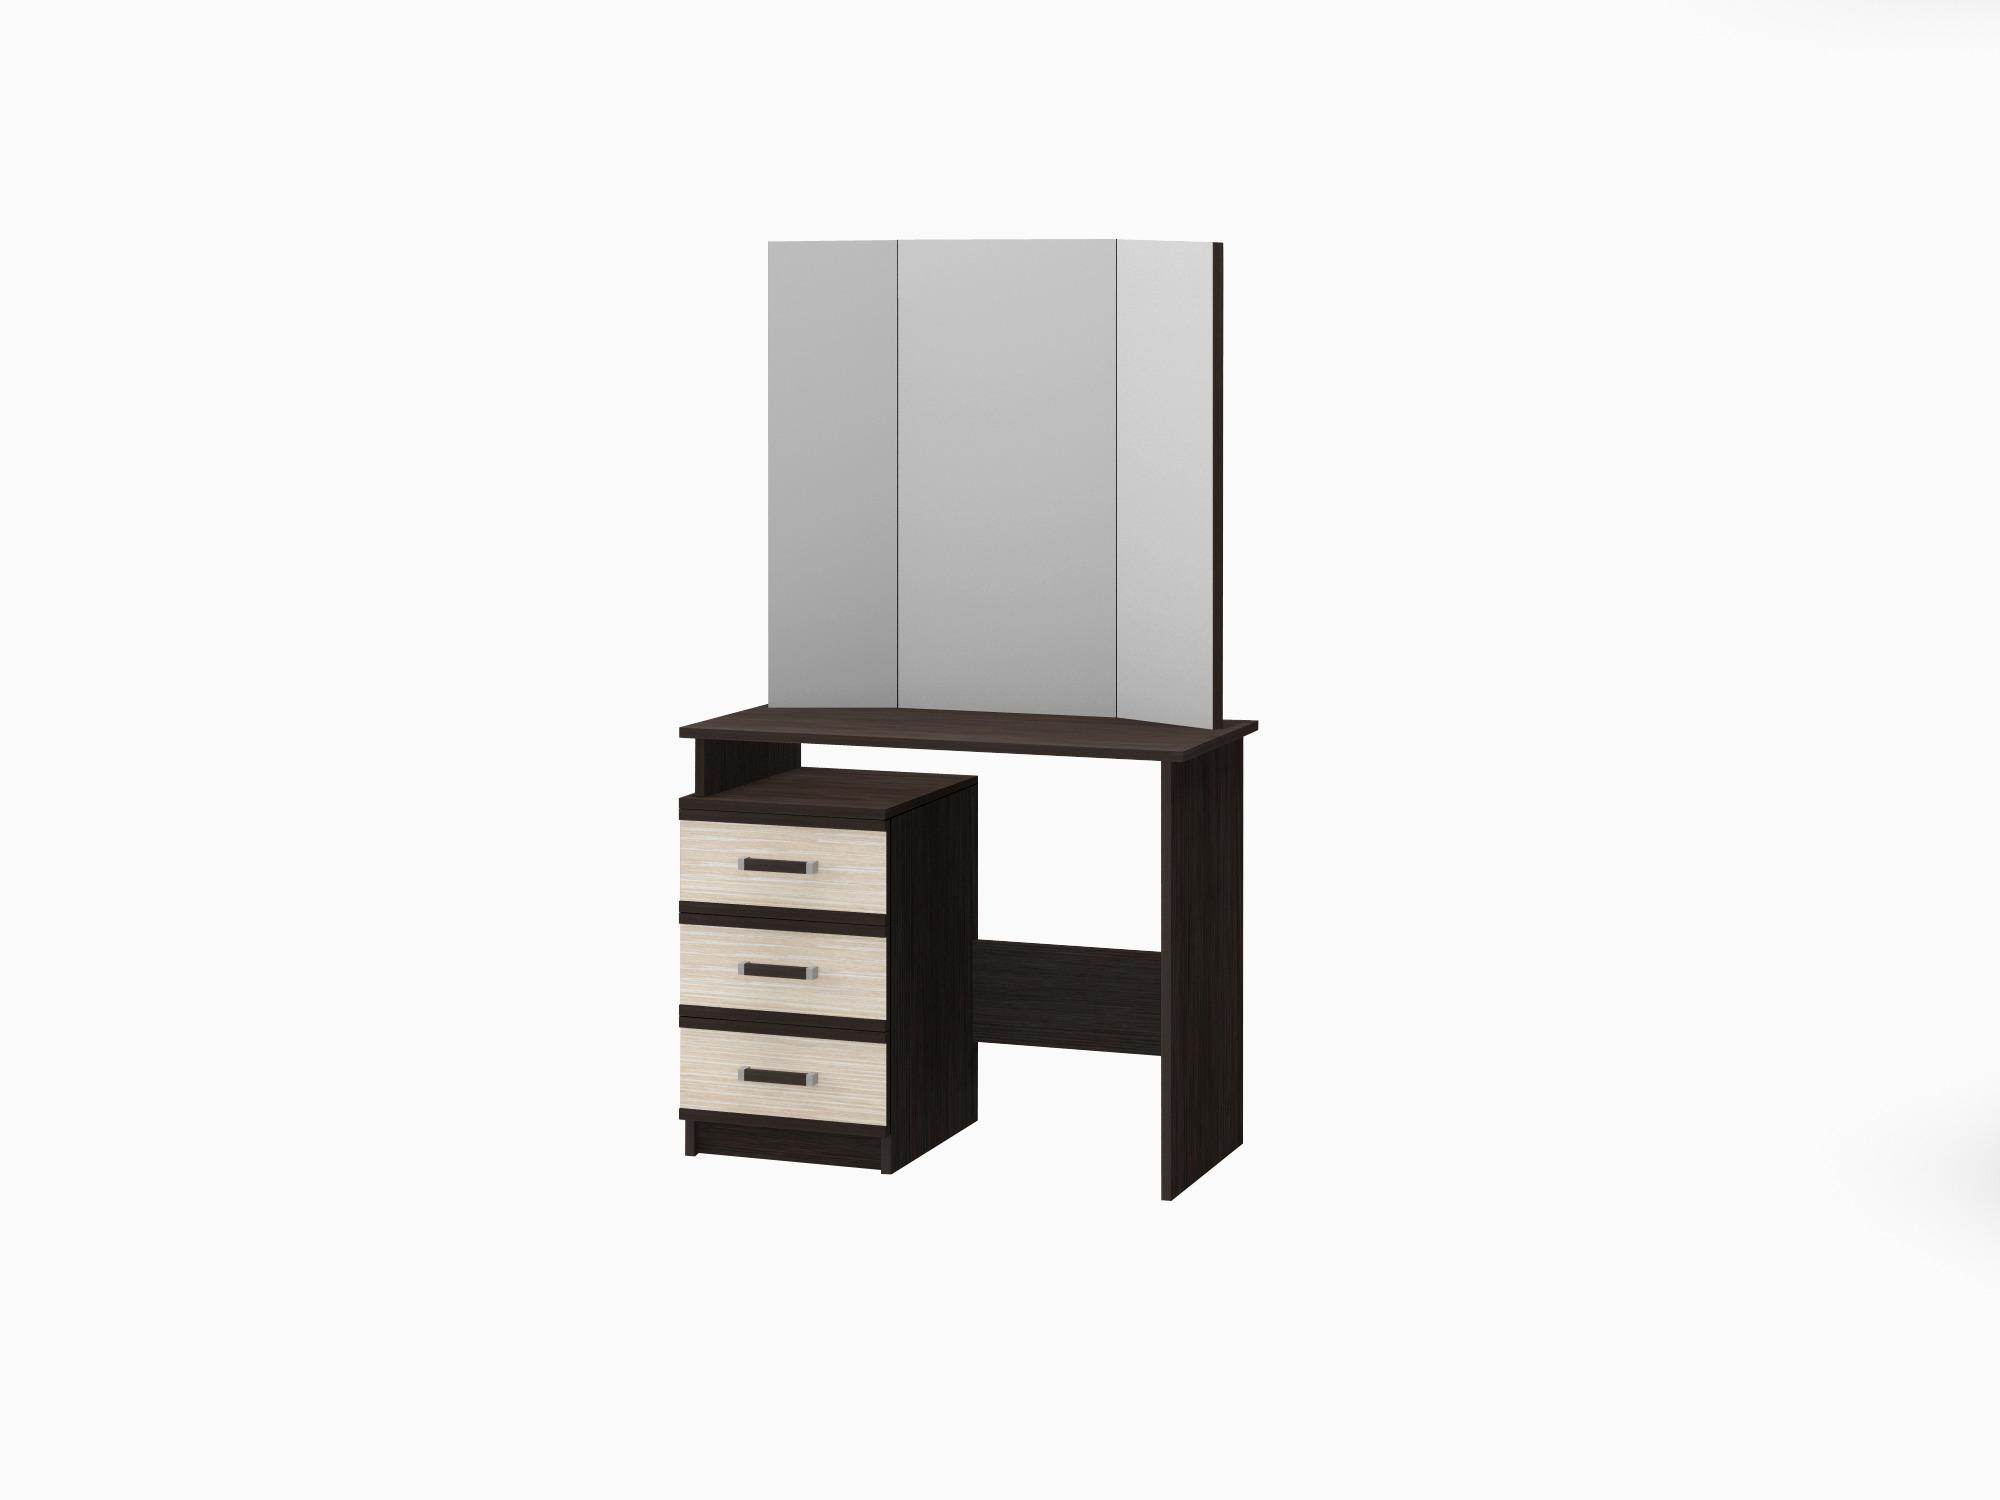 Продажа мебели в интернет-магазине ВашаКомната.РФ – фото 1.103